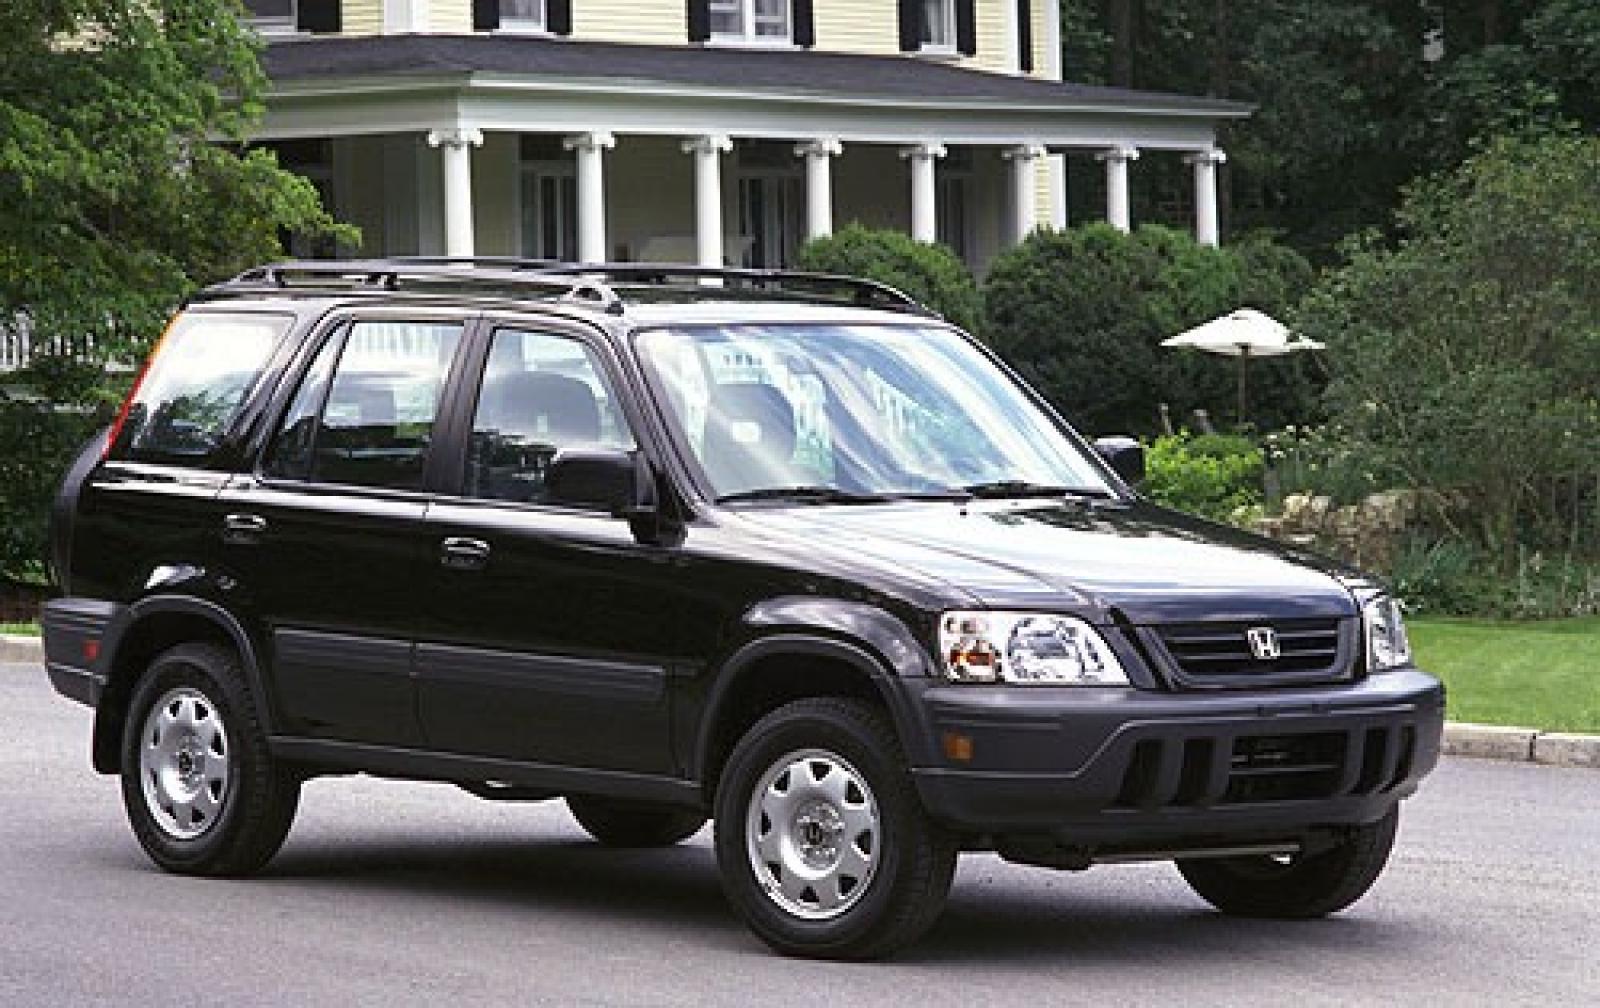 2000 Honda Cr V Information And Photos Zombiedrive 2014 Crv Wiring Diagram 800 1024 1280 1600 Origin